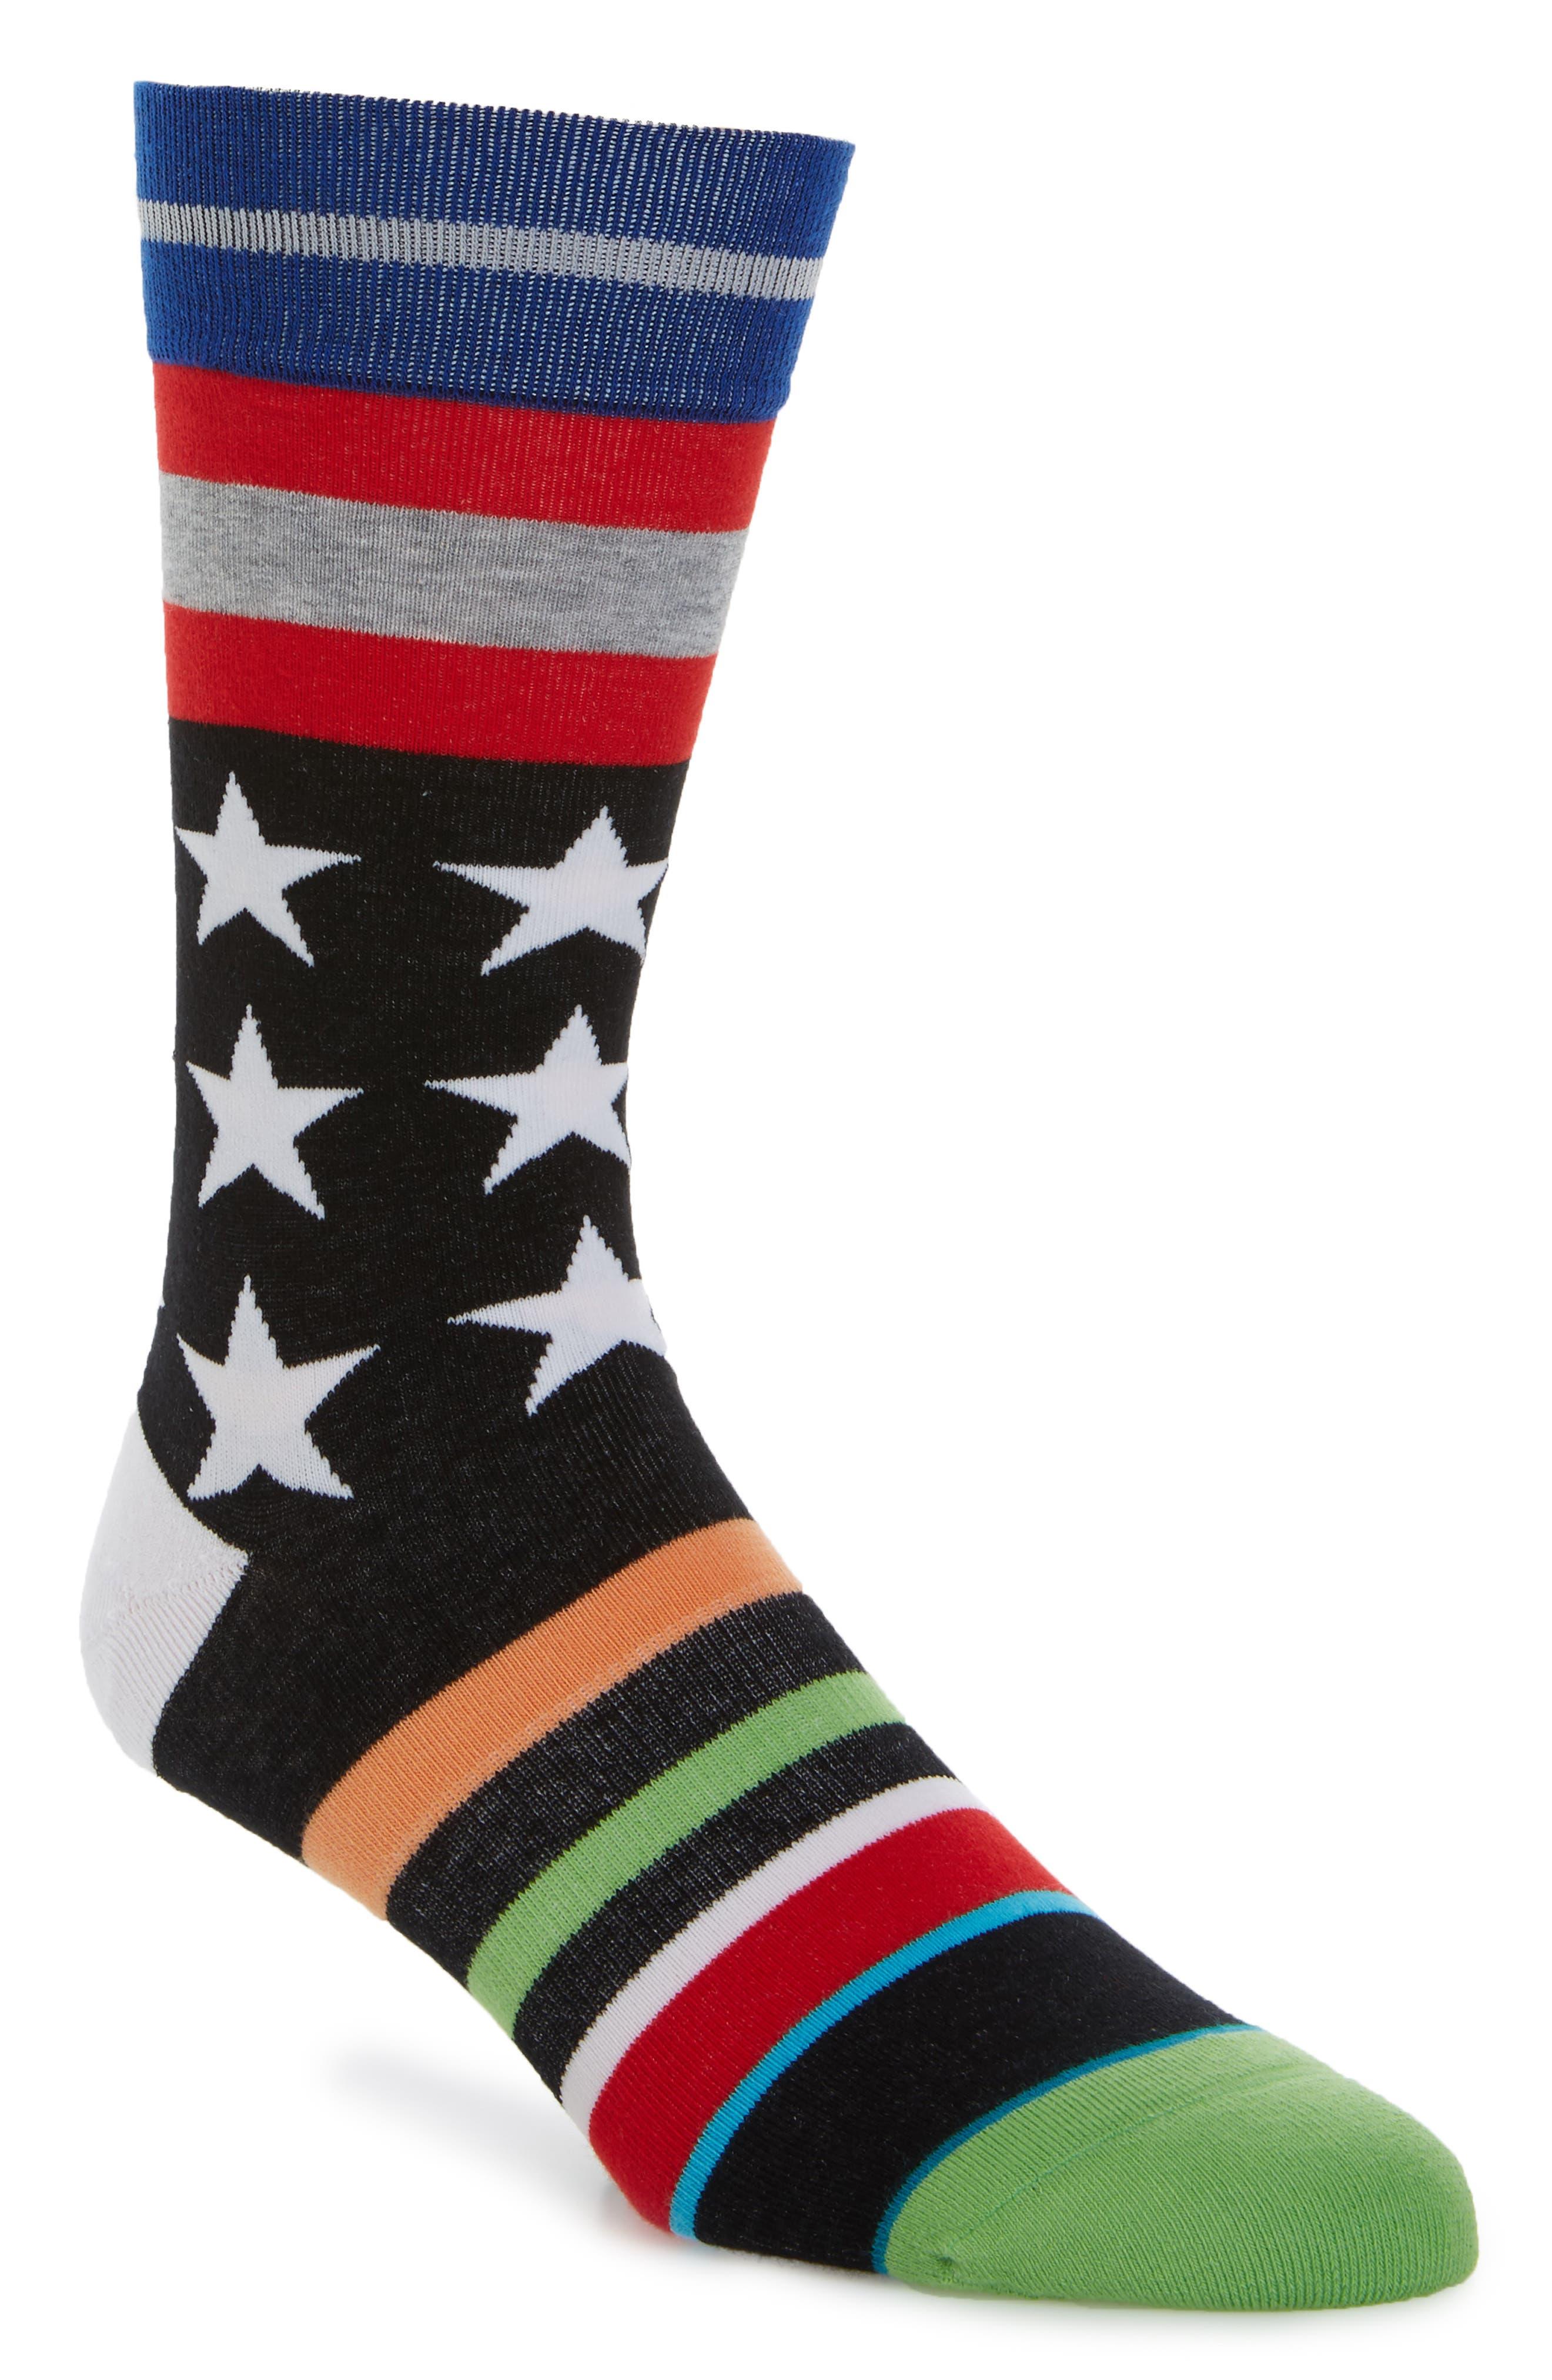 Harden Salute Socks,                         Main,                         color, 001